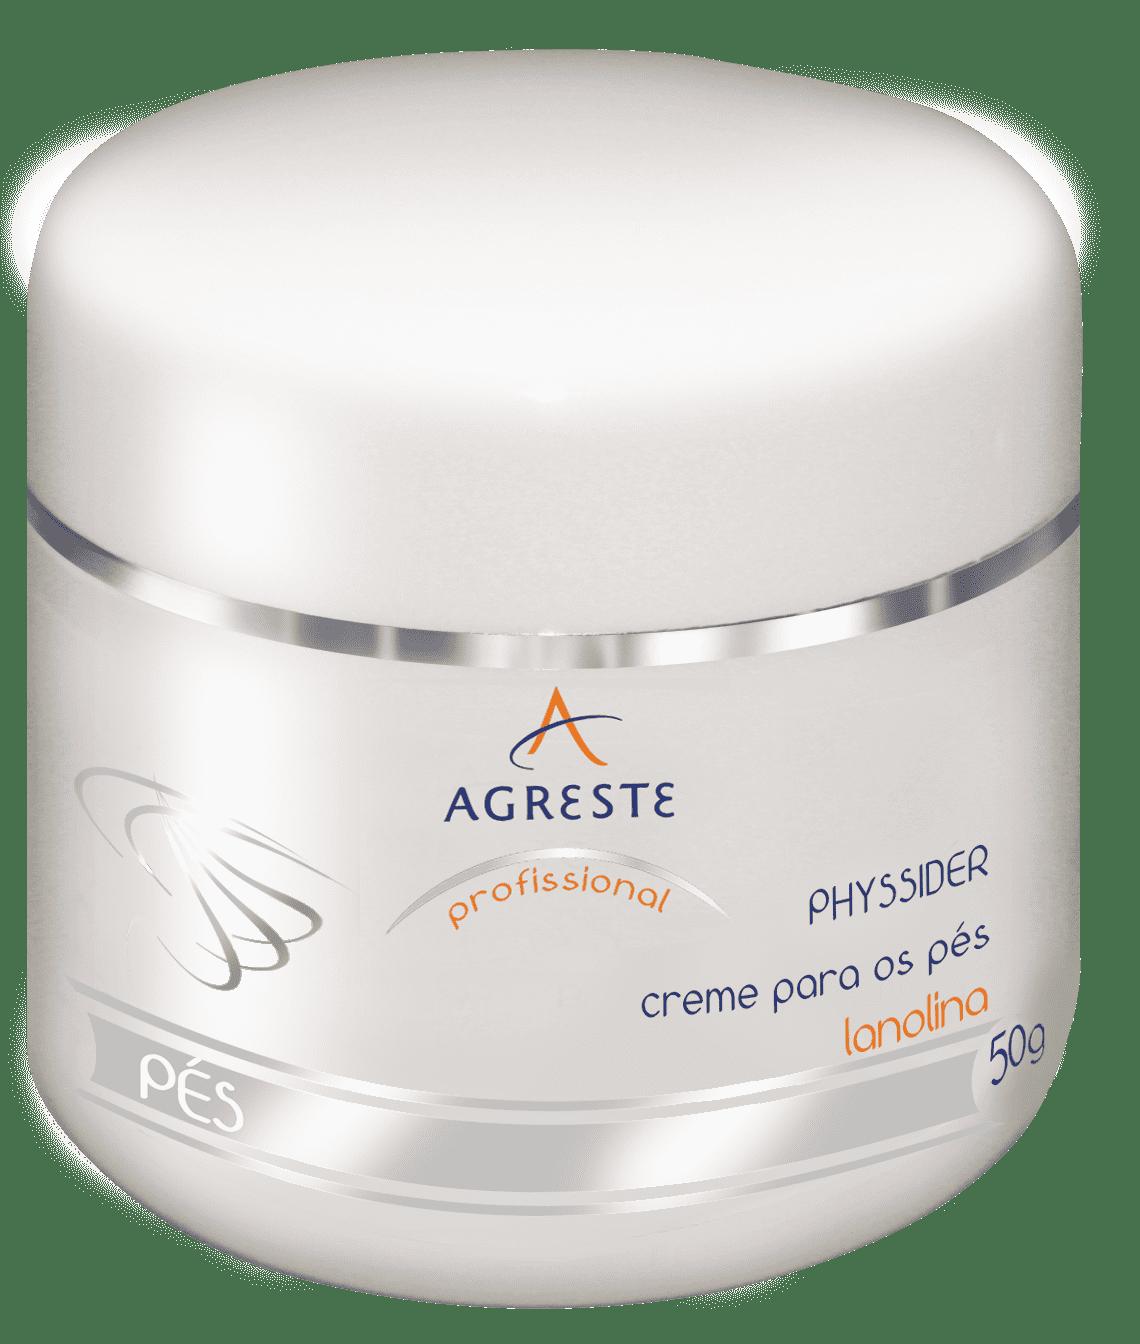 Physsider Creme para os Pés - 50 g  - Agreste Brasil - Cosmética Profissional